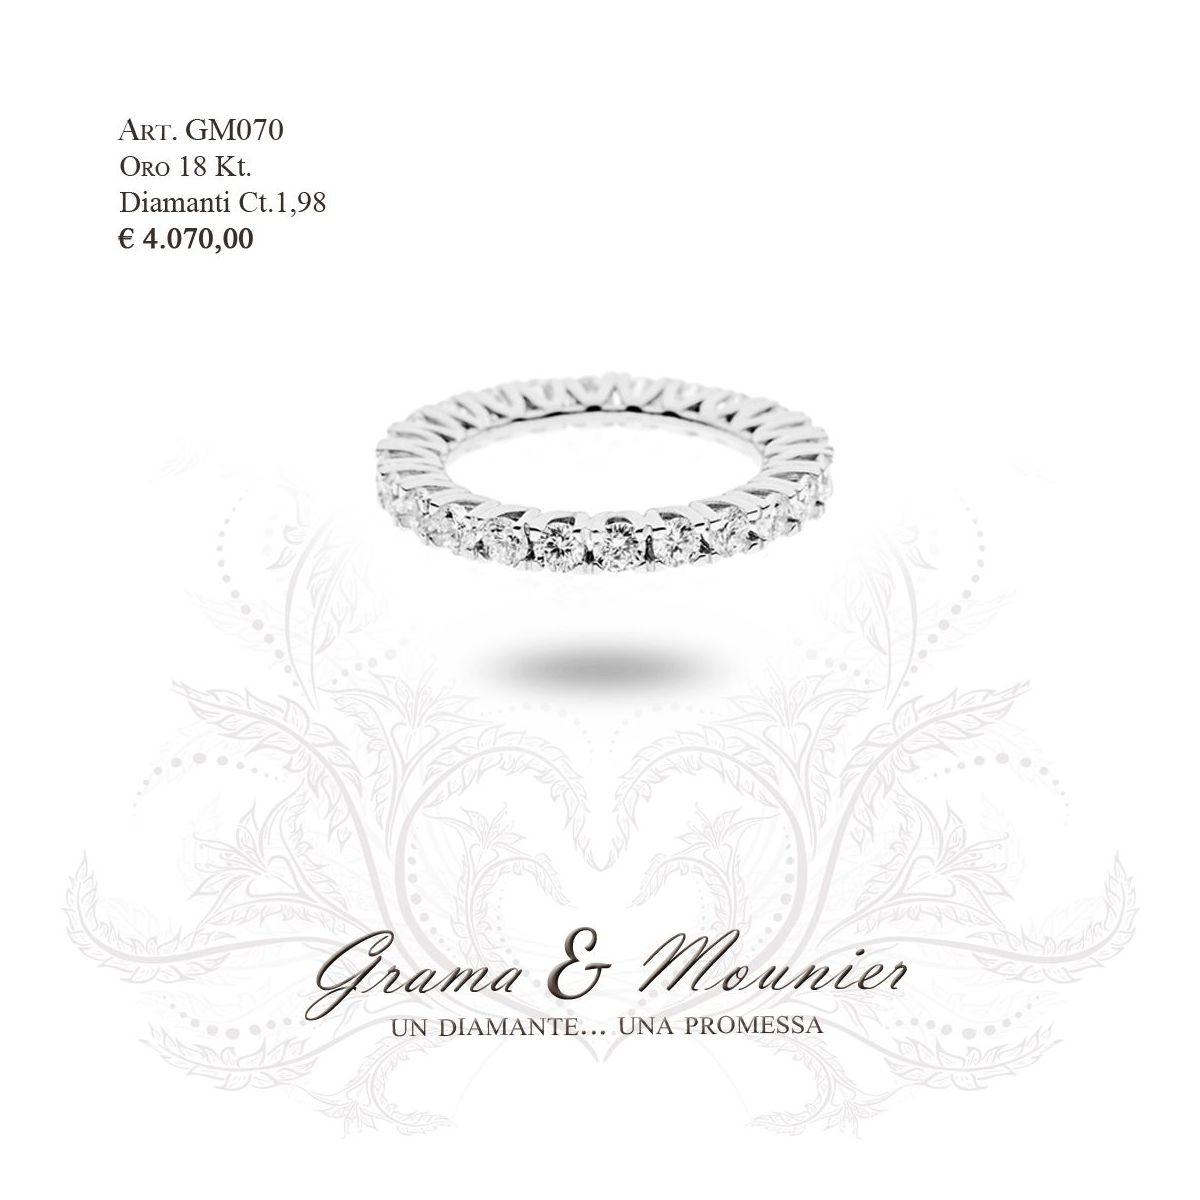 Anello in oro 18Kt. Grama&Mounier Art.GM070/12/15